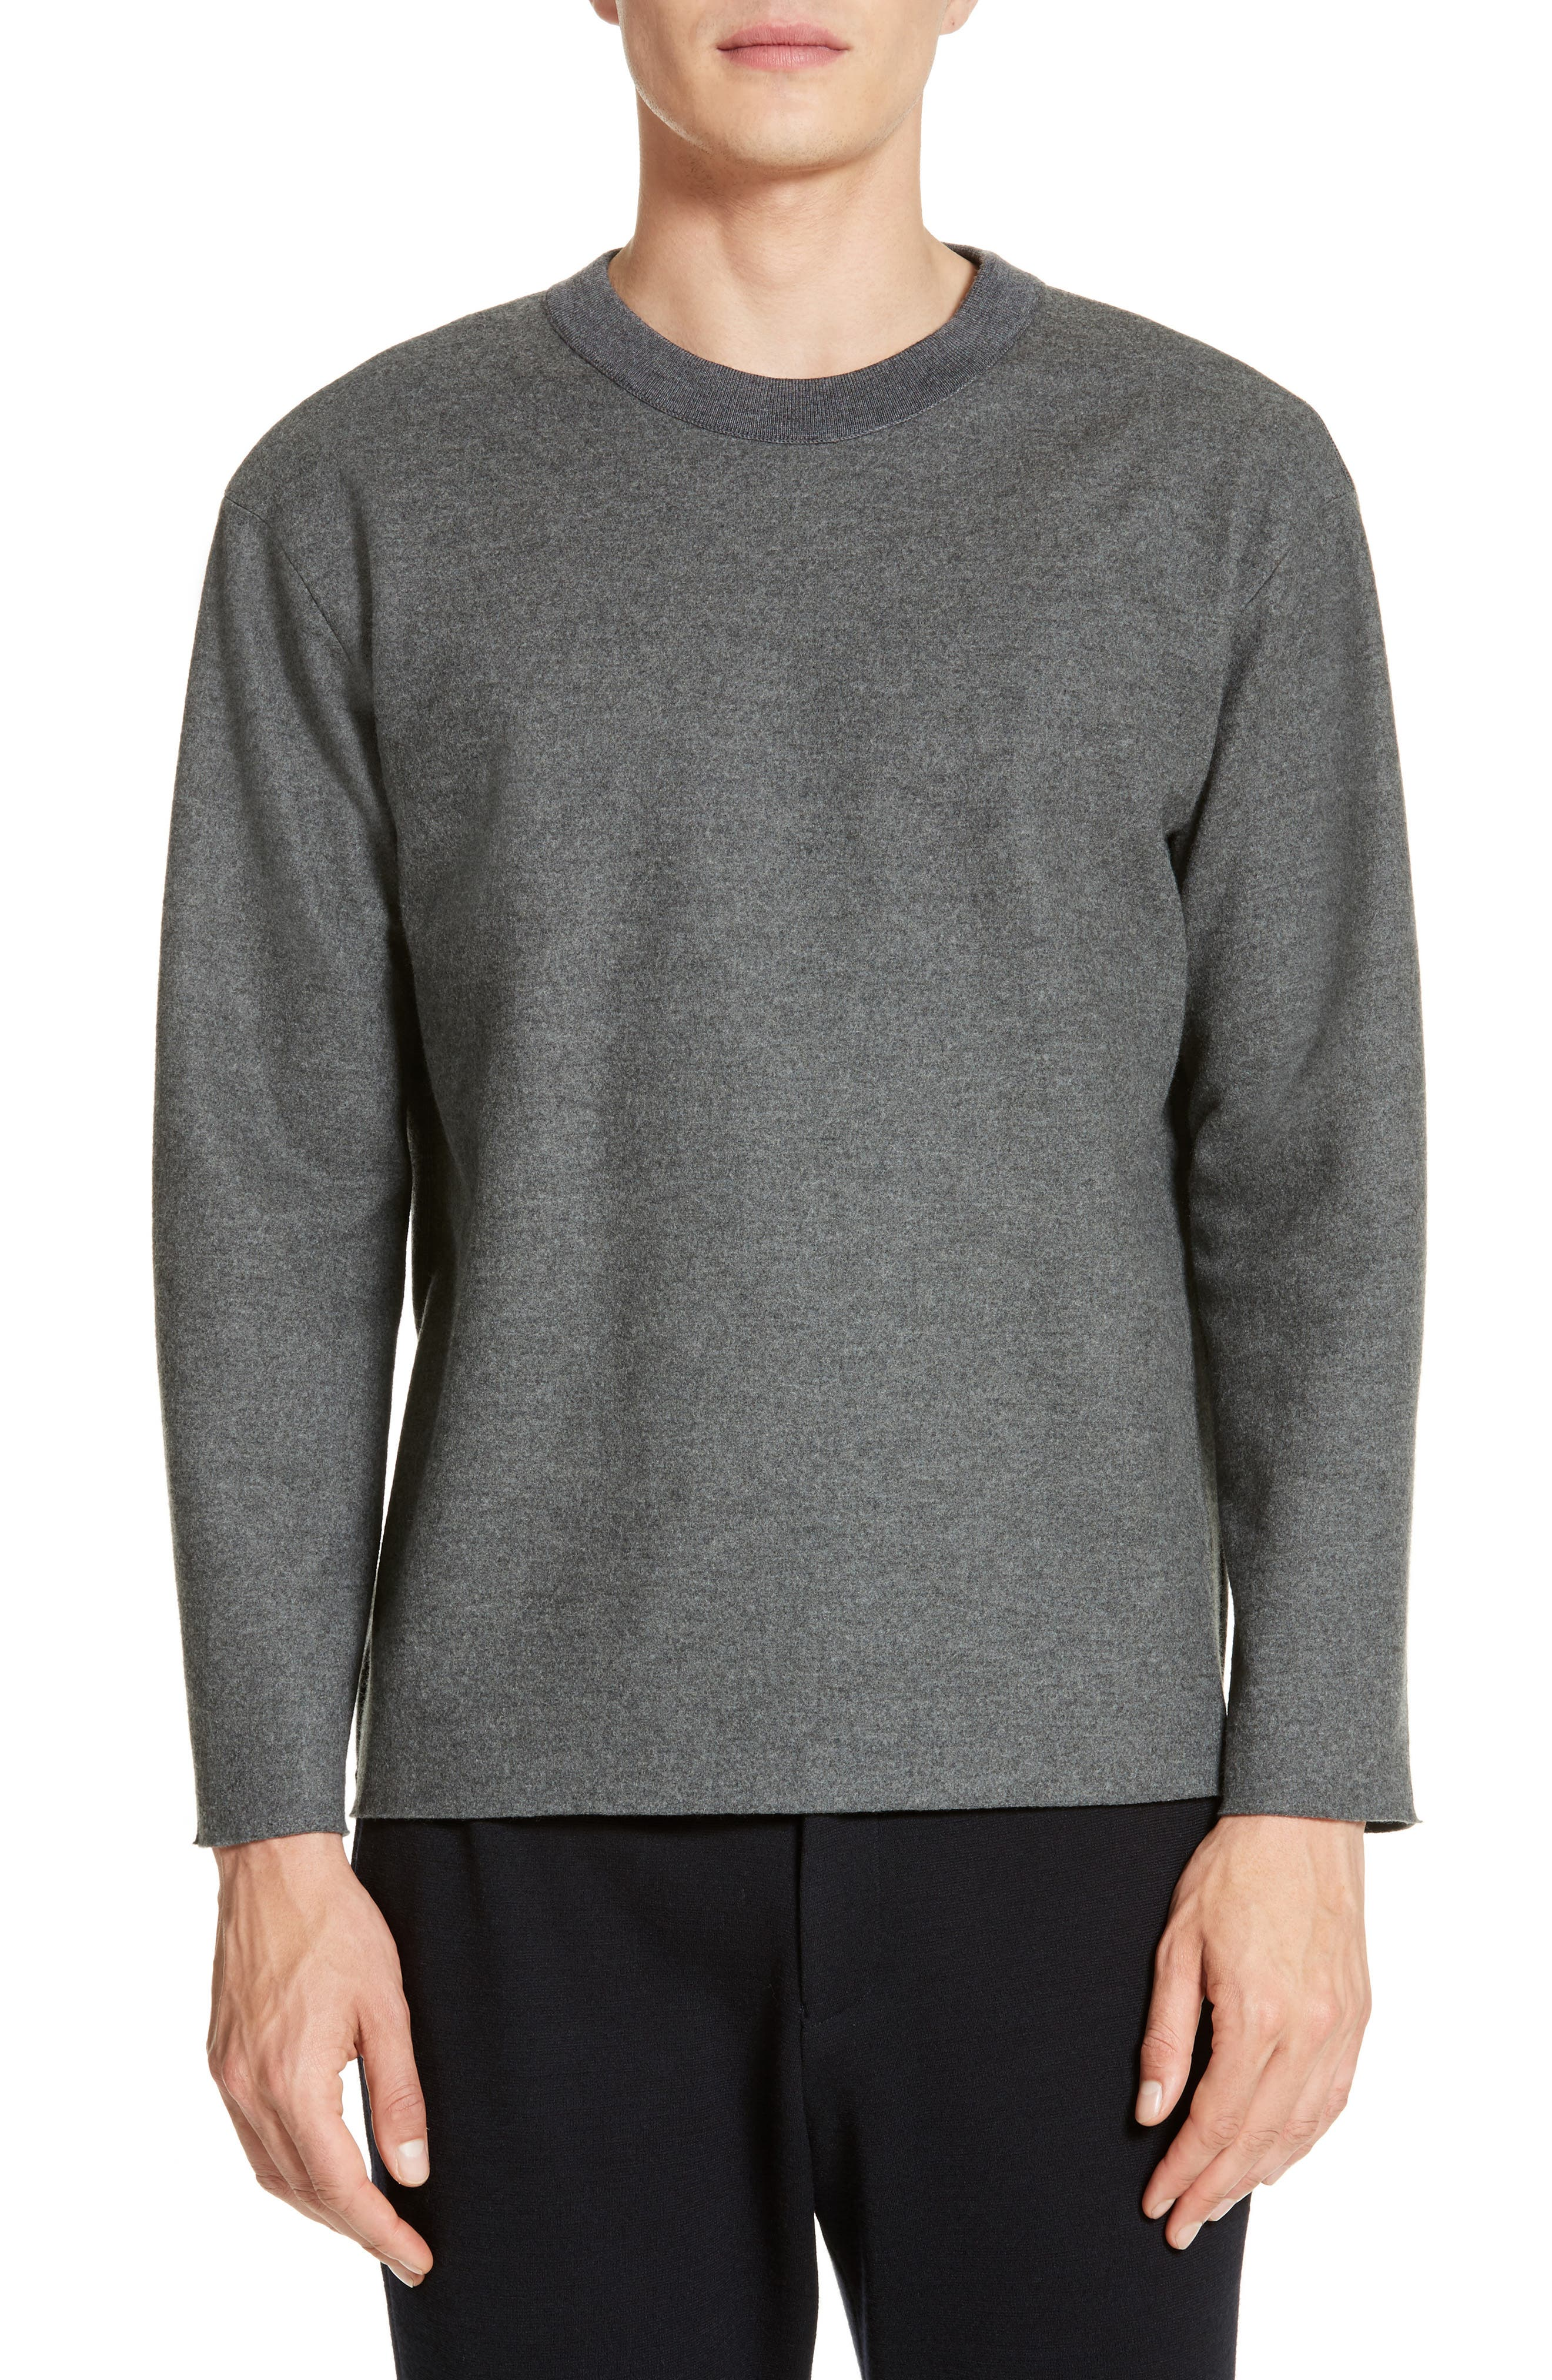 Hyper Compress Sweatshirt,                             Main thumbnail 1, color,                             020